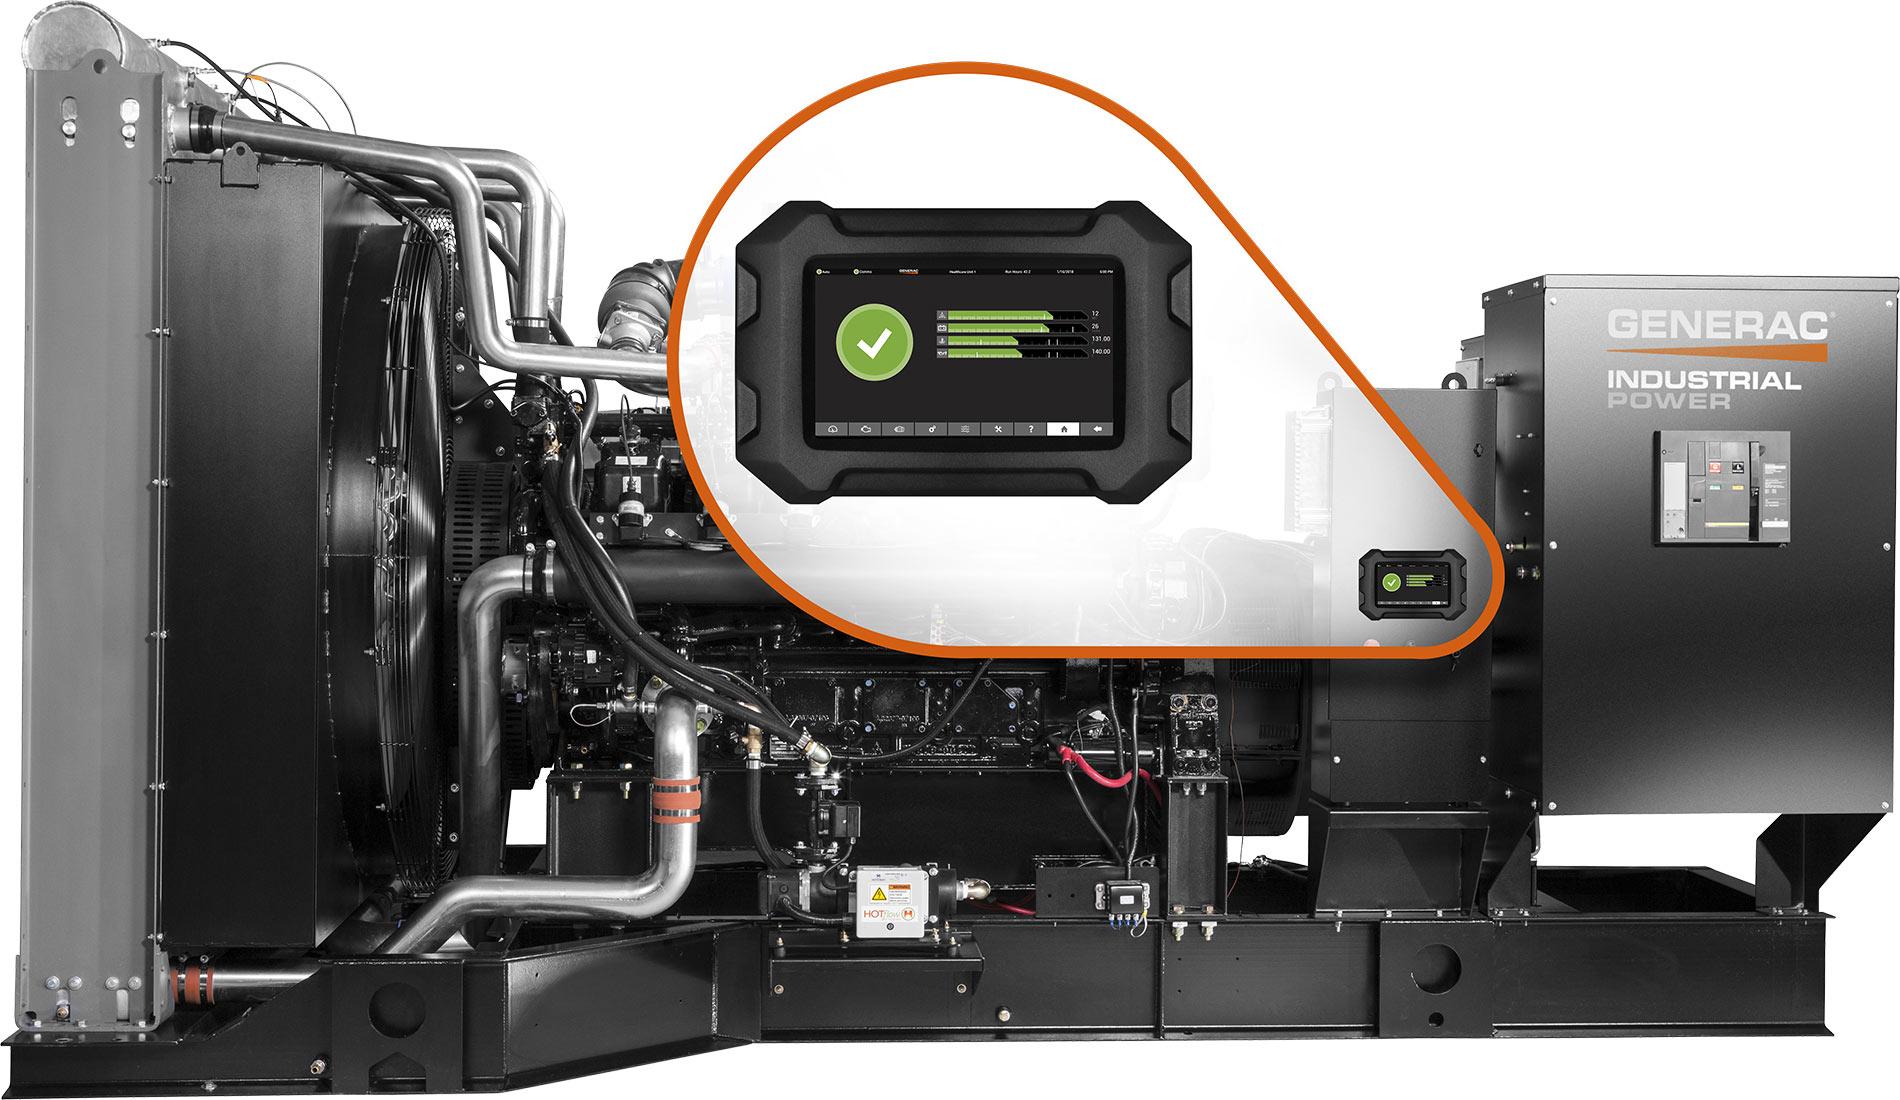 generac-powerzone-controller-on-generator-0.jpg